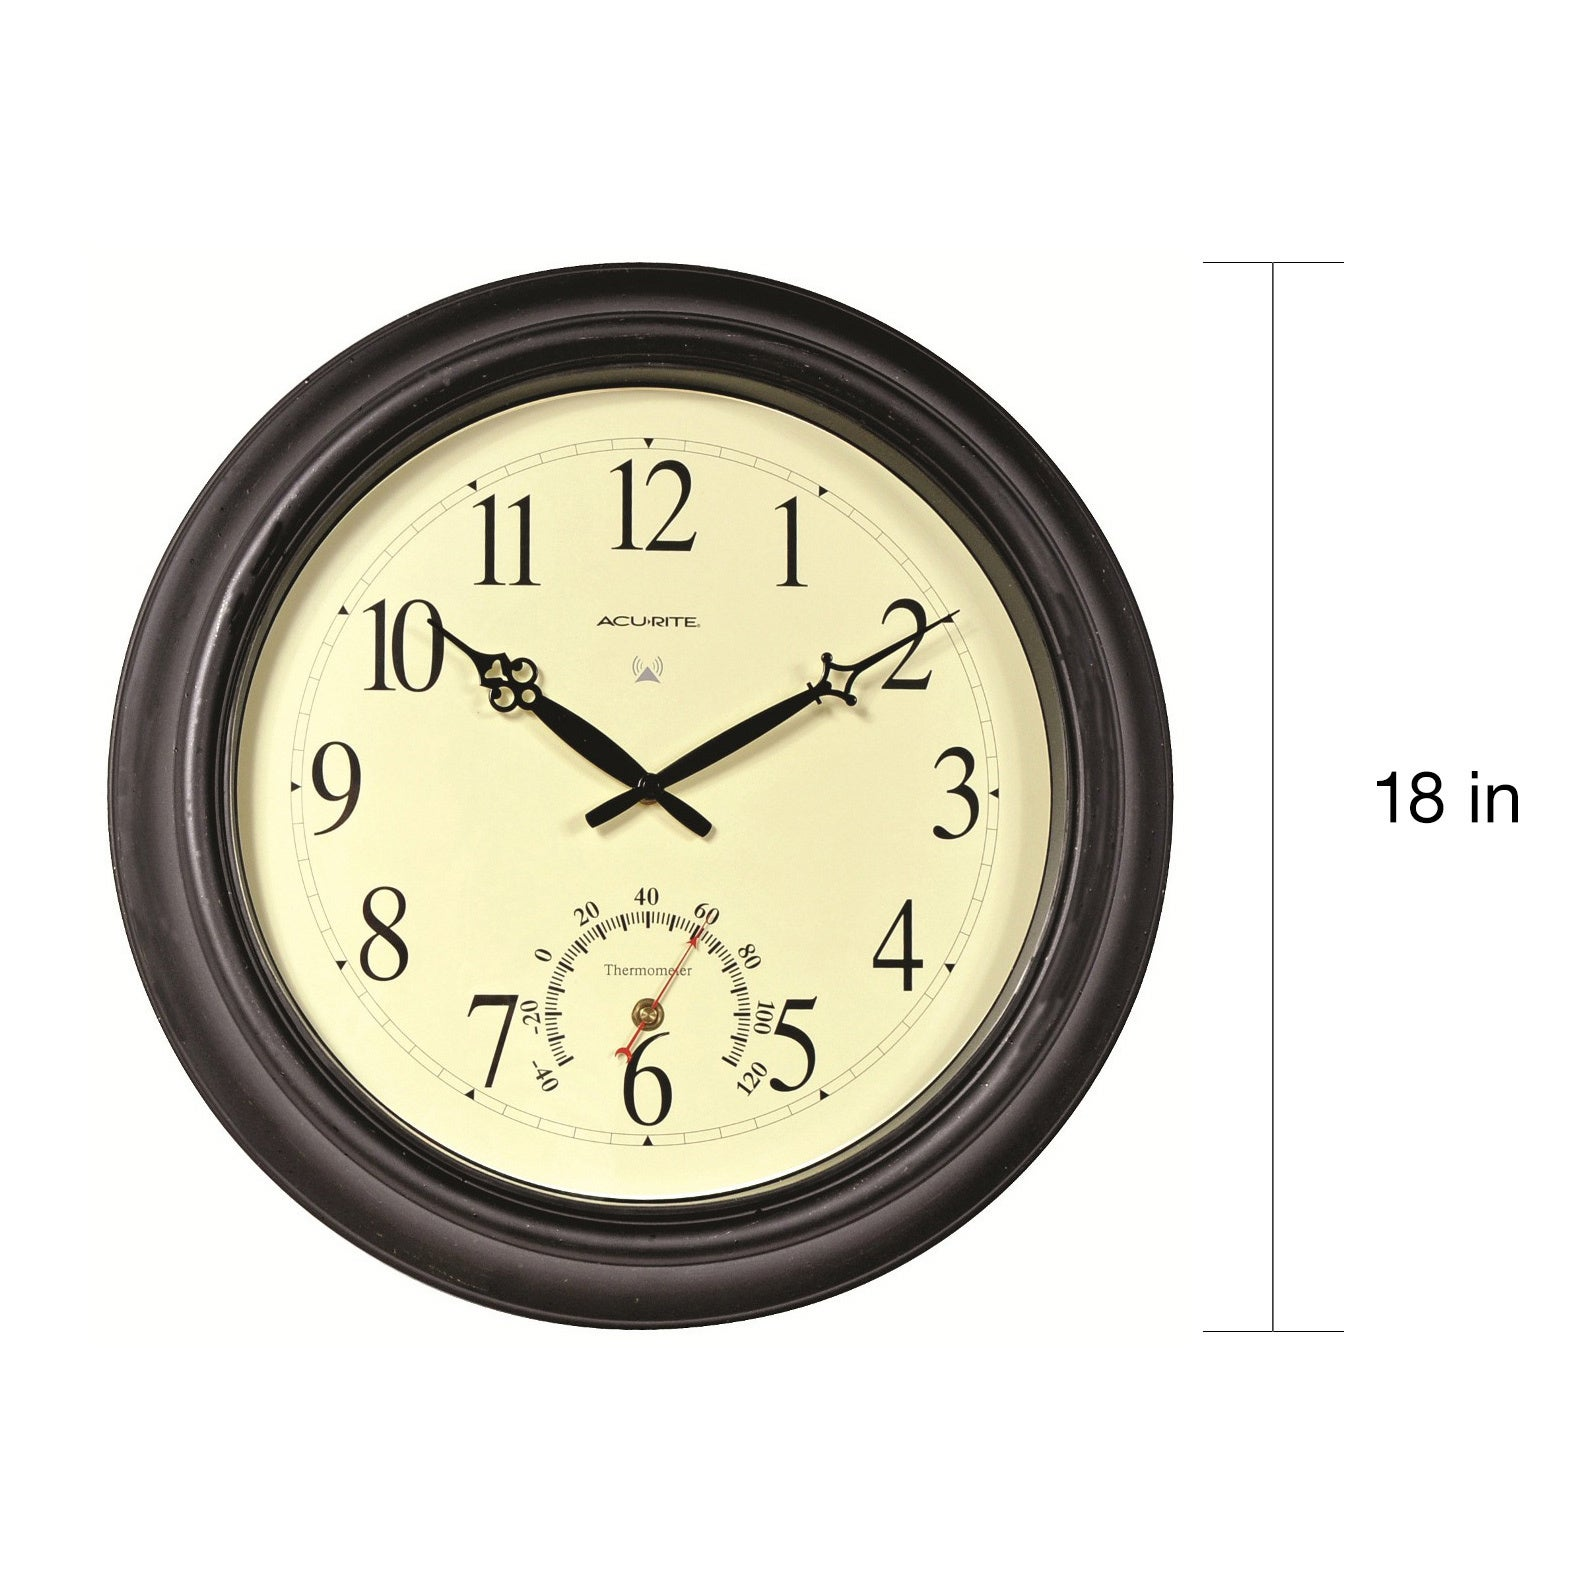 Shop Acu-rite 18-inch Outdoor Atomic Wall Clock - Free Shipping ...